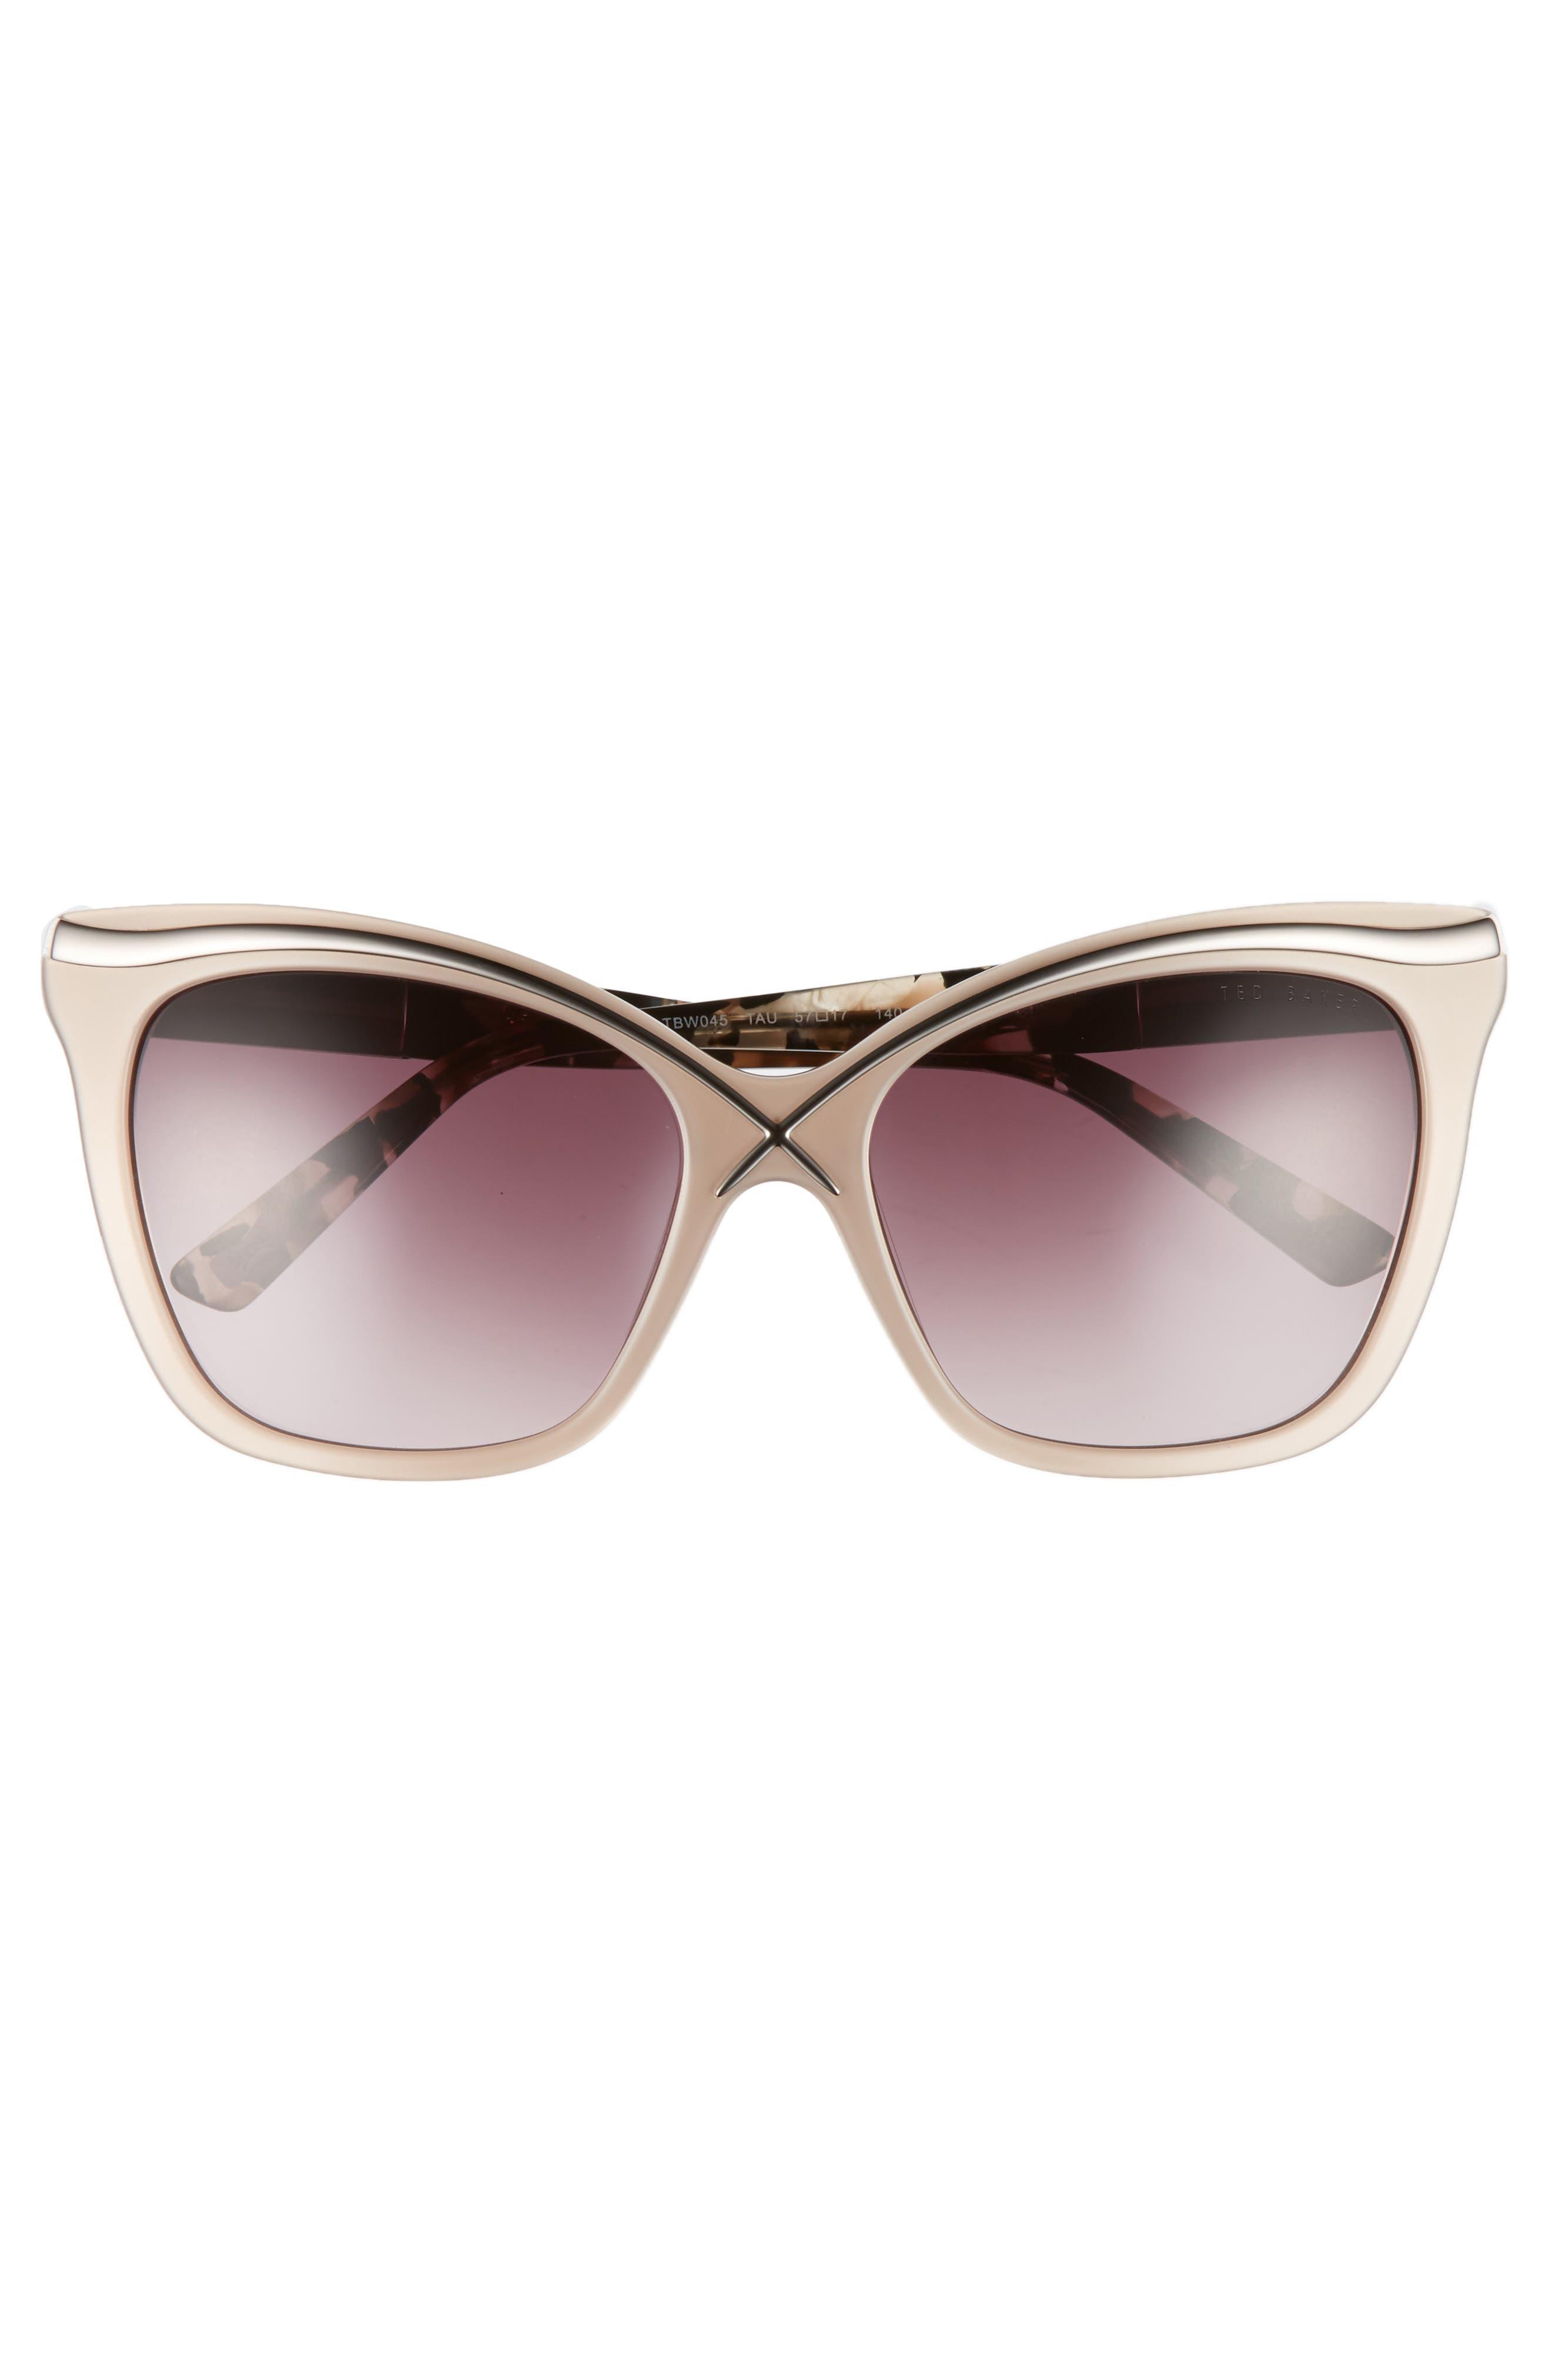 57mm Square Cat Eye Sunglasses,                             Alternate thumbnail 9, color,